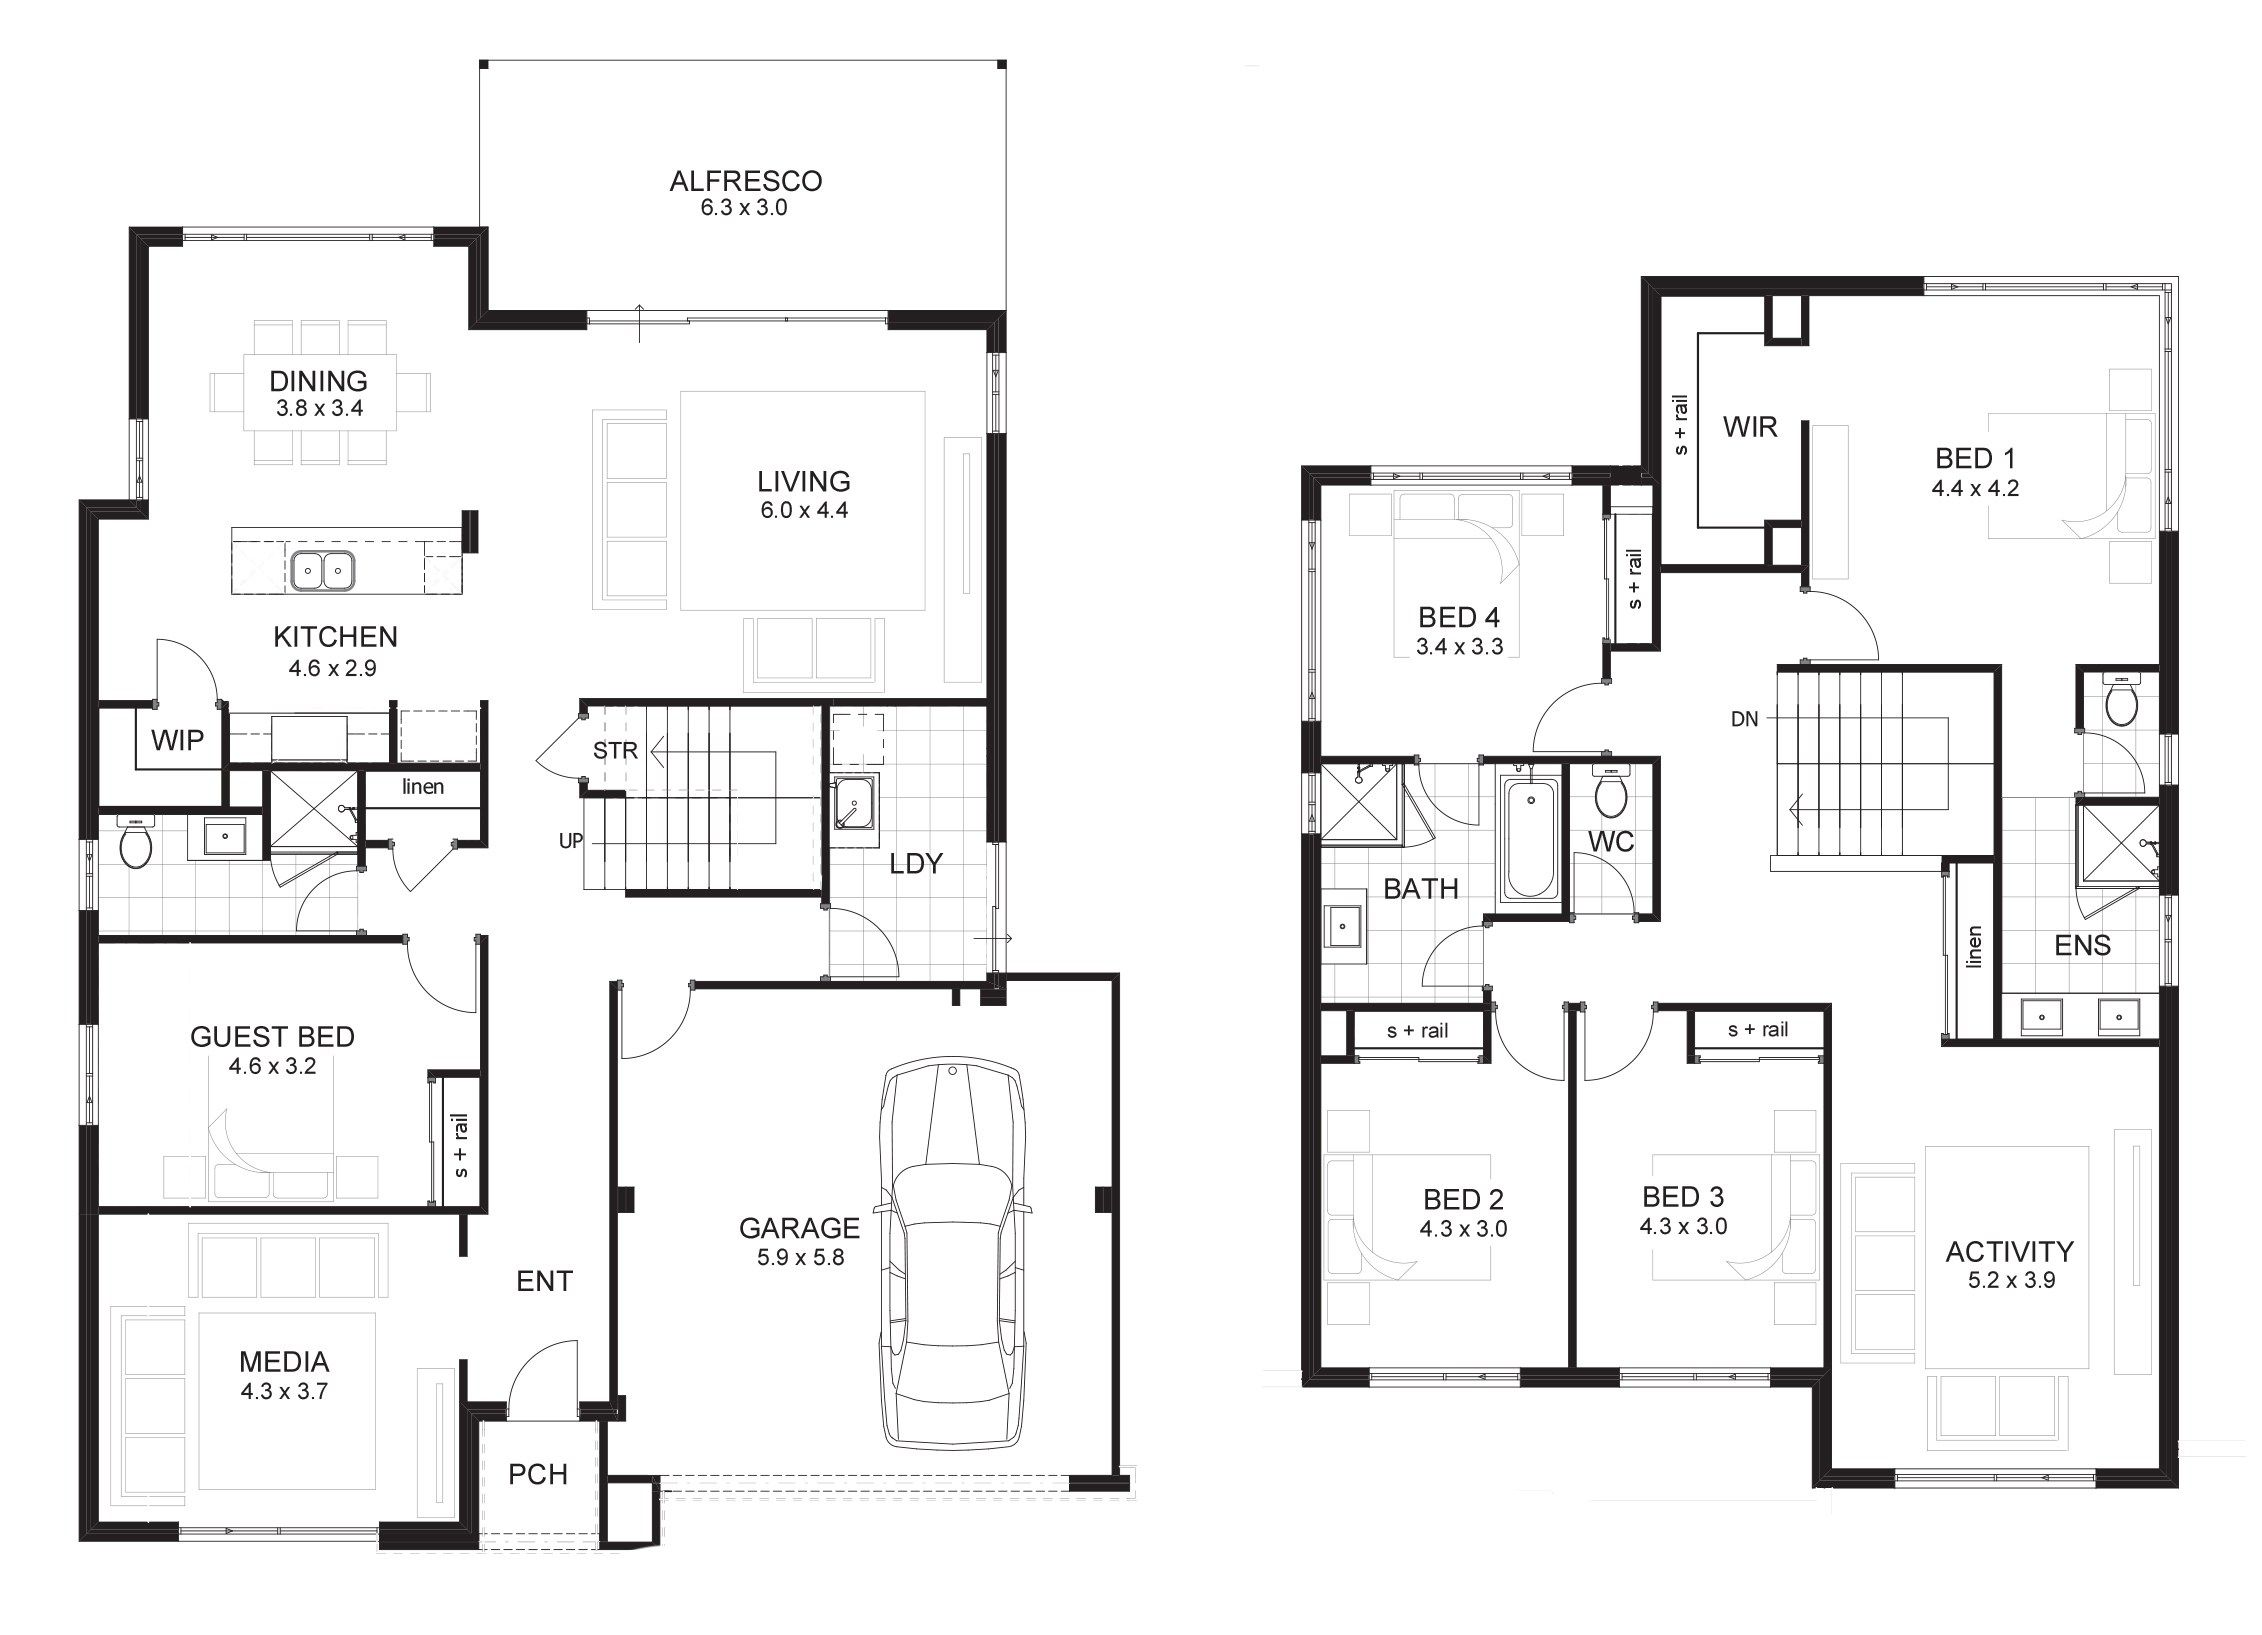 Free house plans australia designs | house plan | Pinterest | House ...